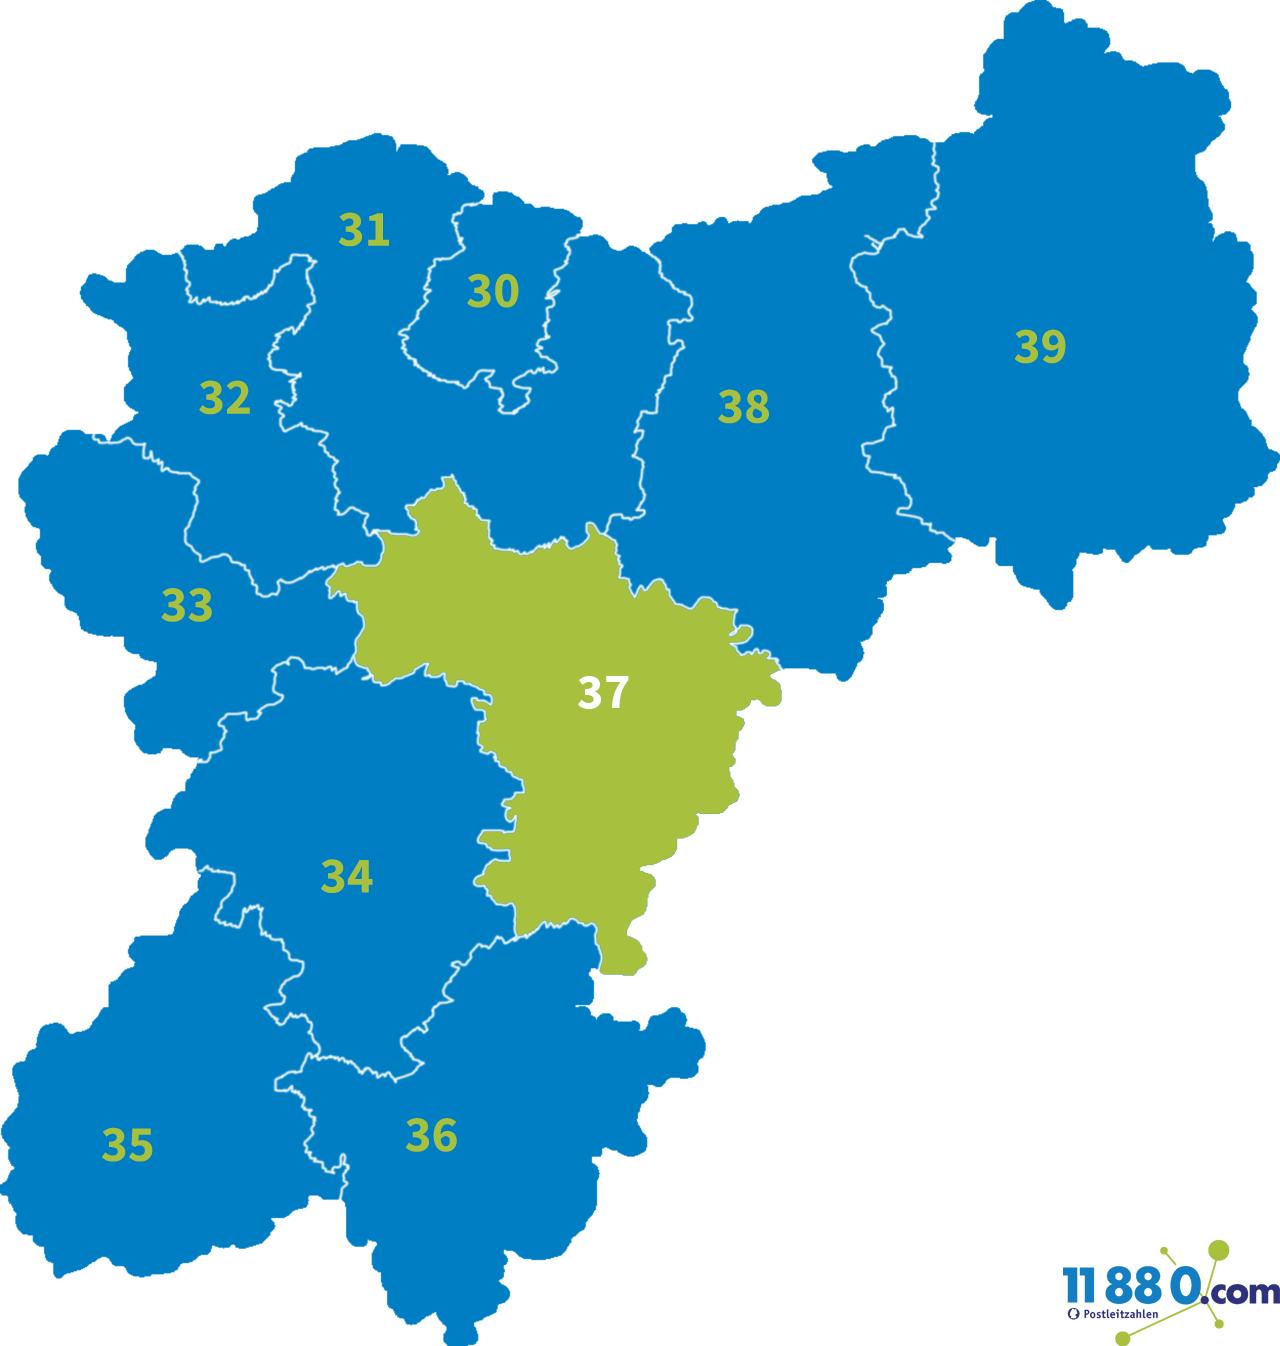 PLZ 37 - Postleitzahl Bereich 37 » postleitzahlen.de